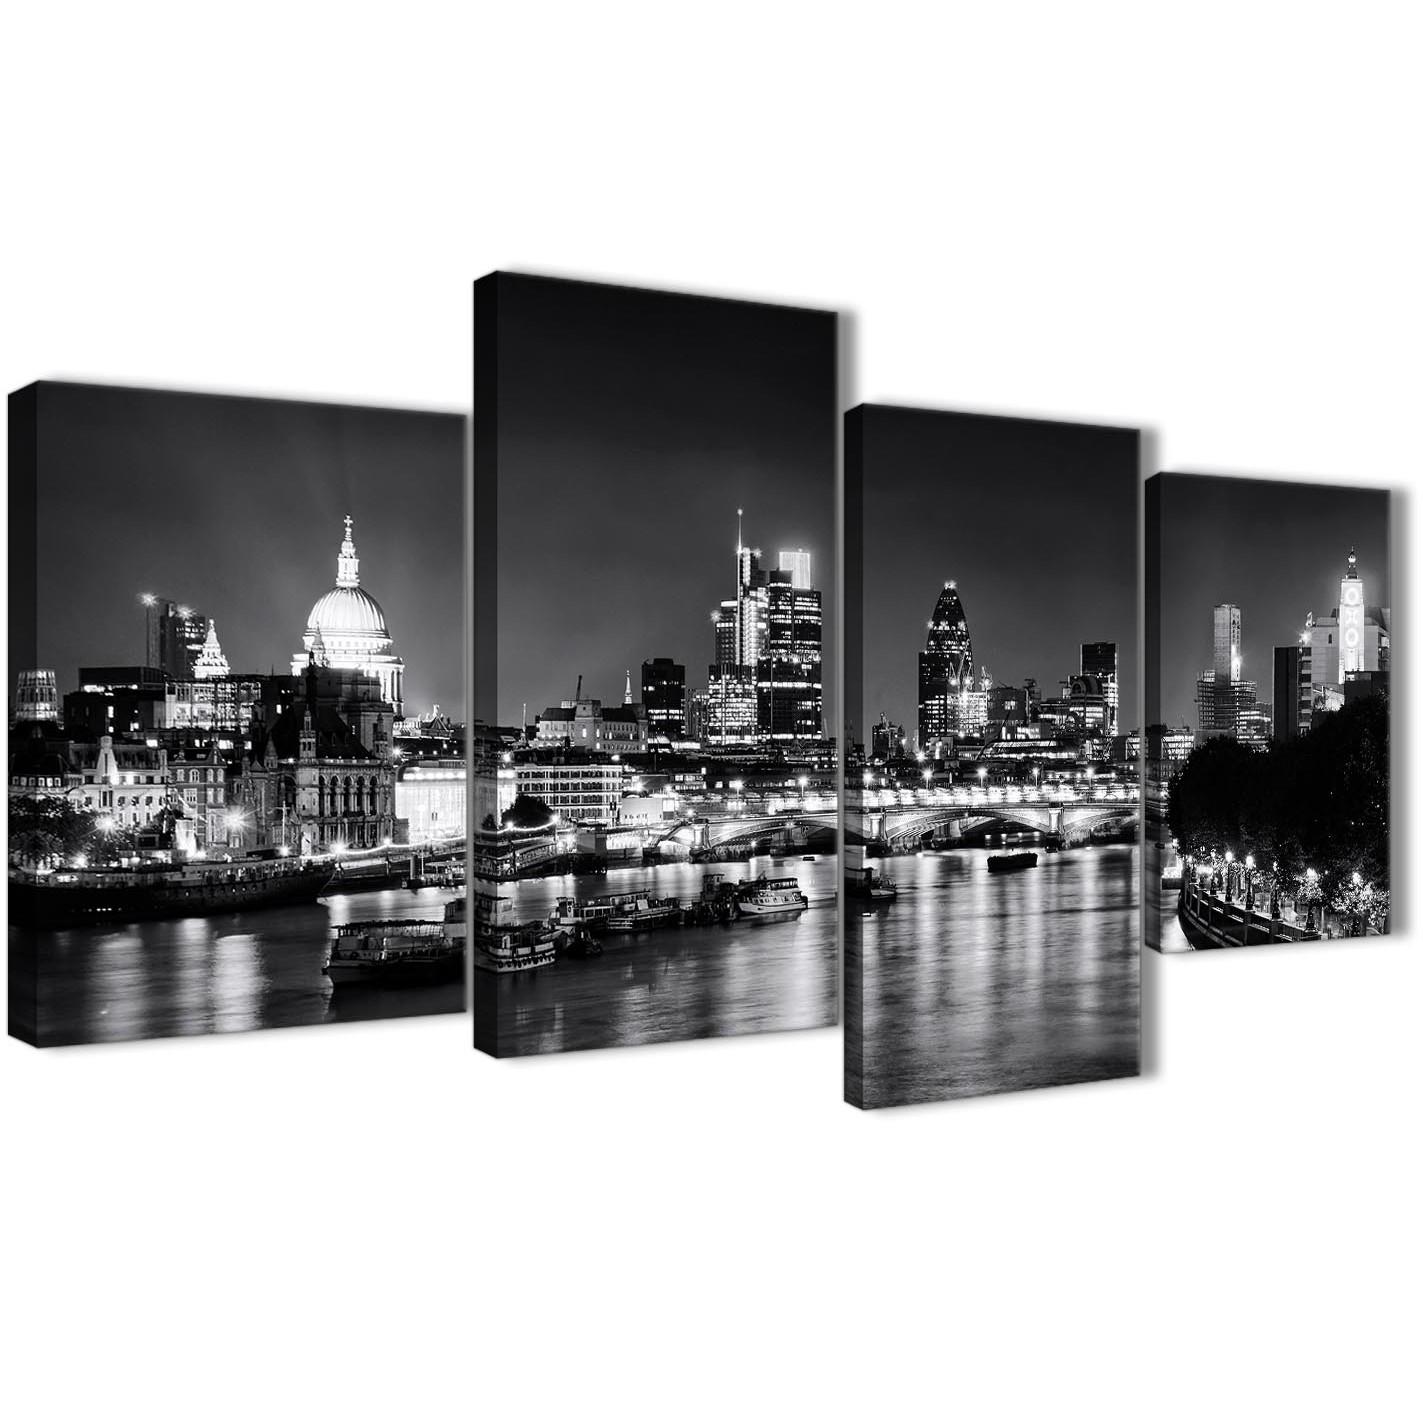 River thames london skyline canvas art pictures